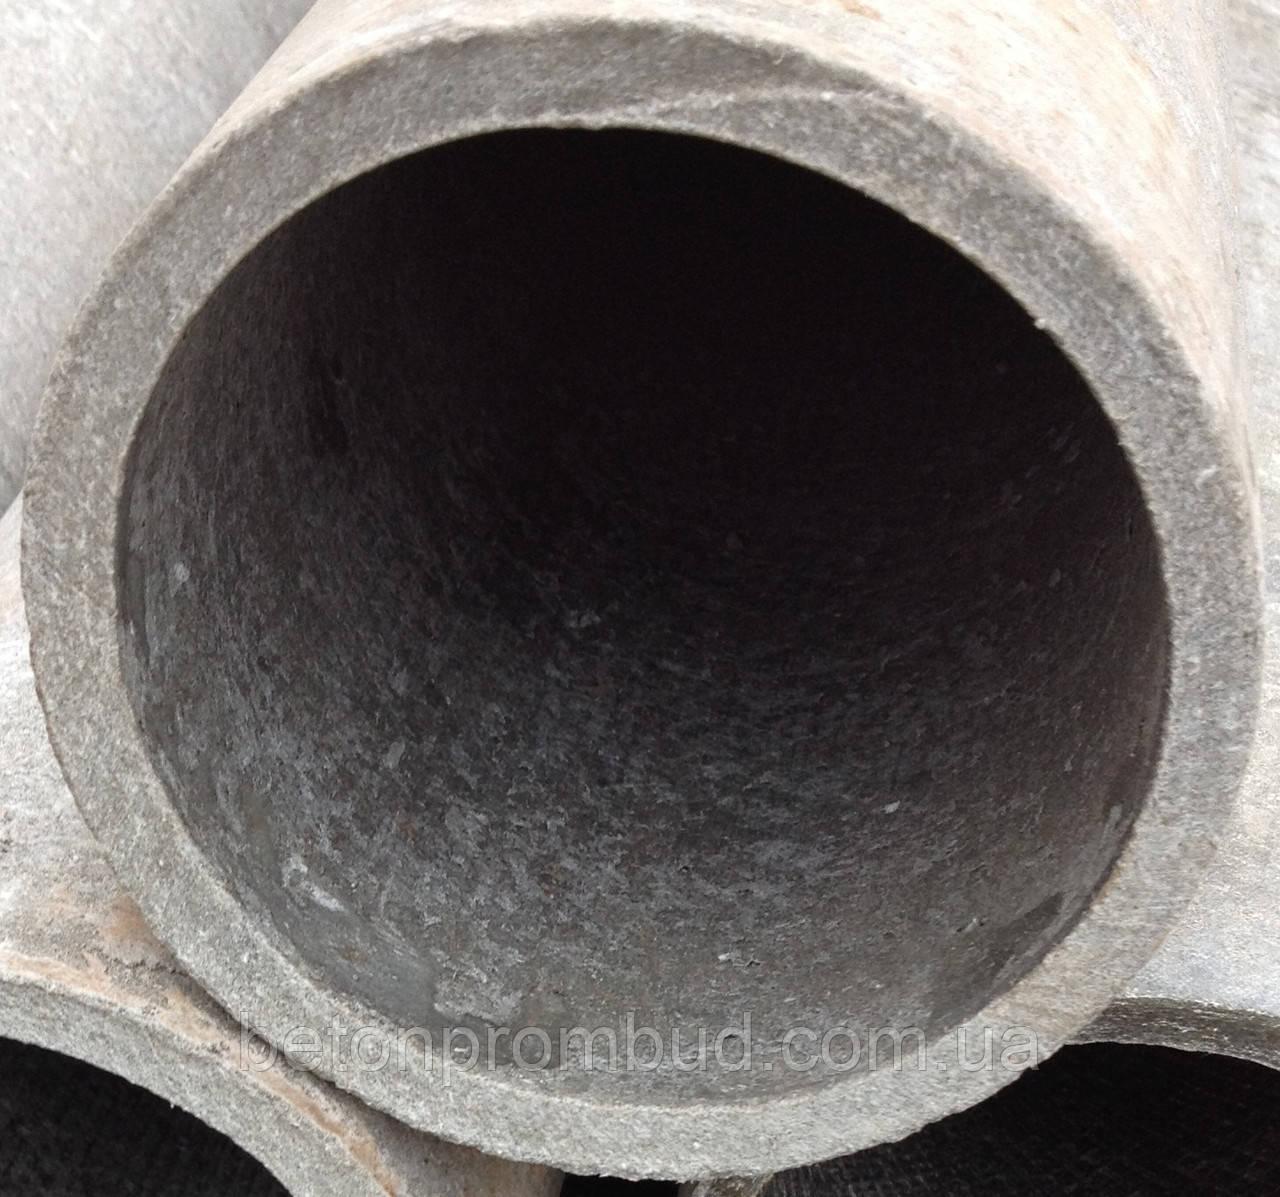 Безнапірна Труба азбестоцементна, d=200 мм